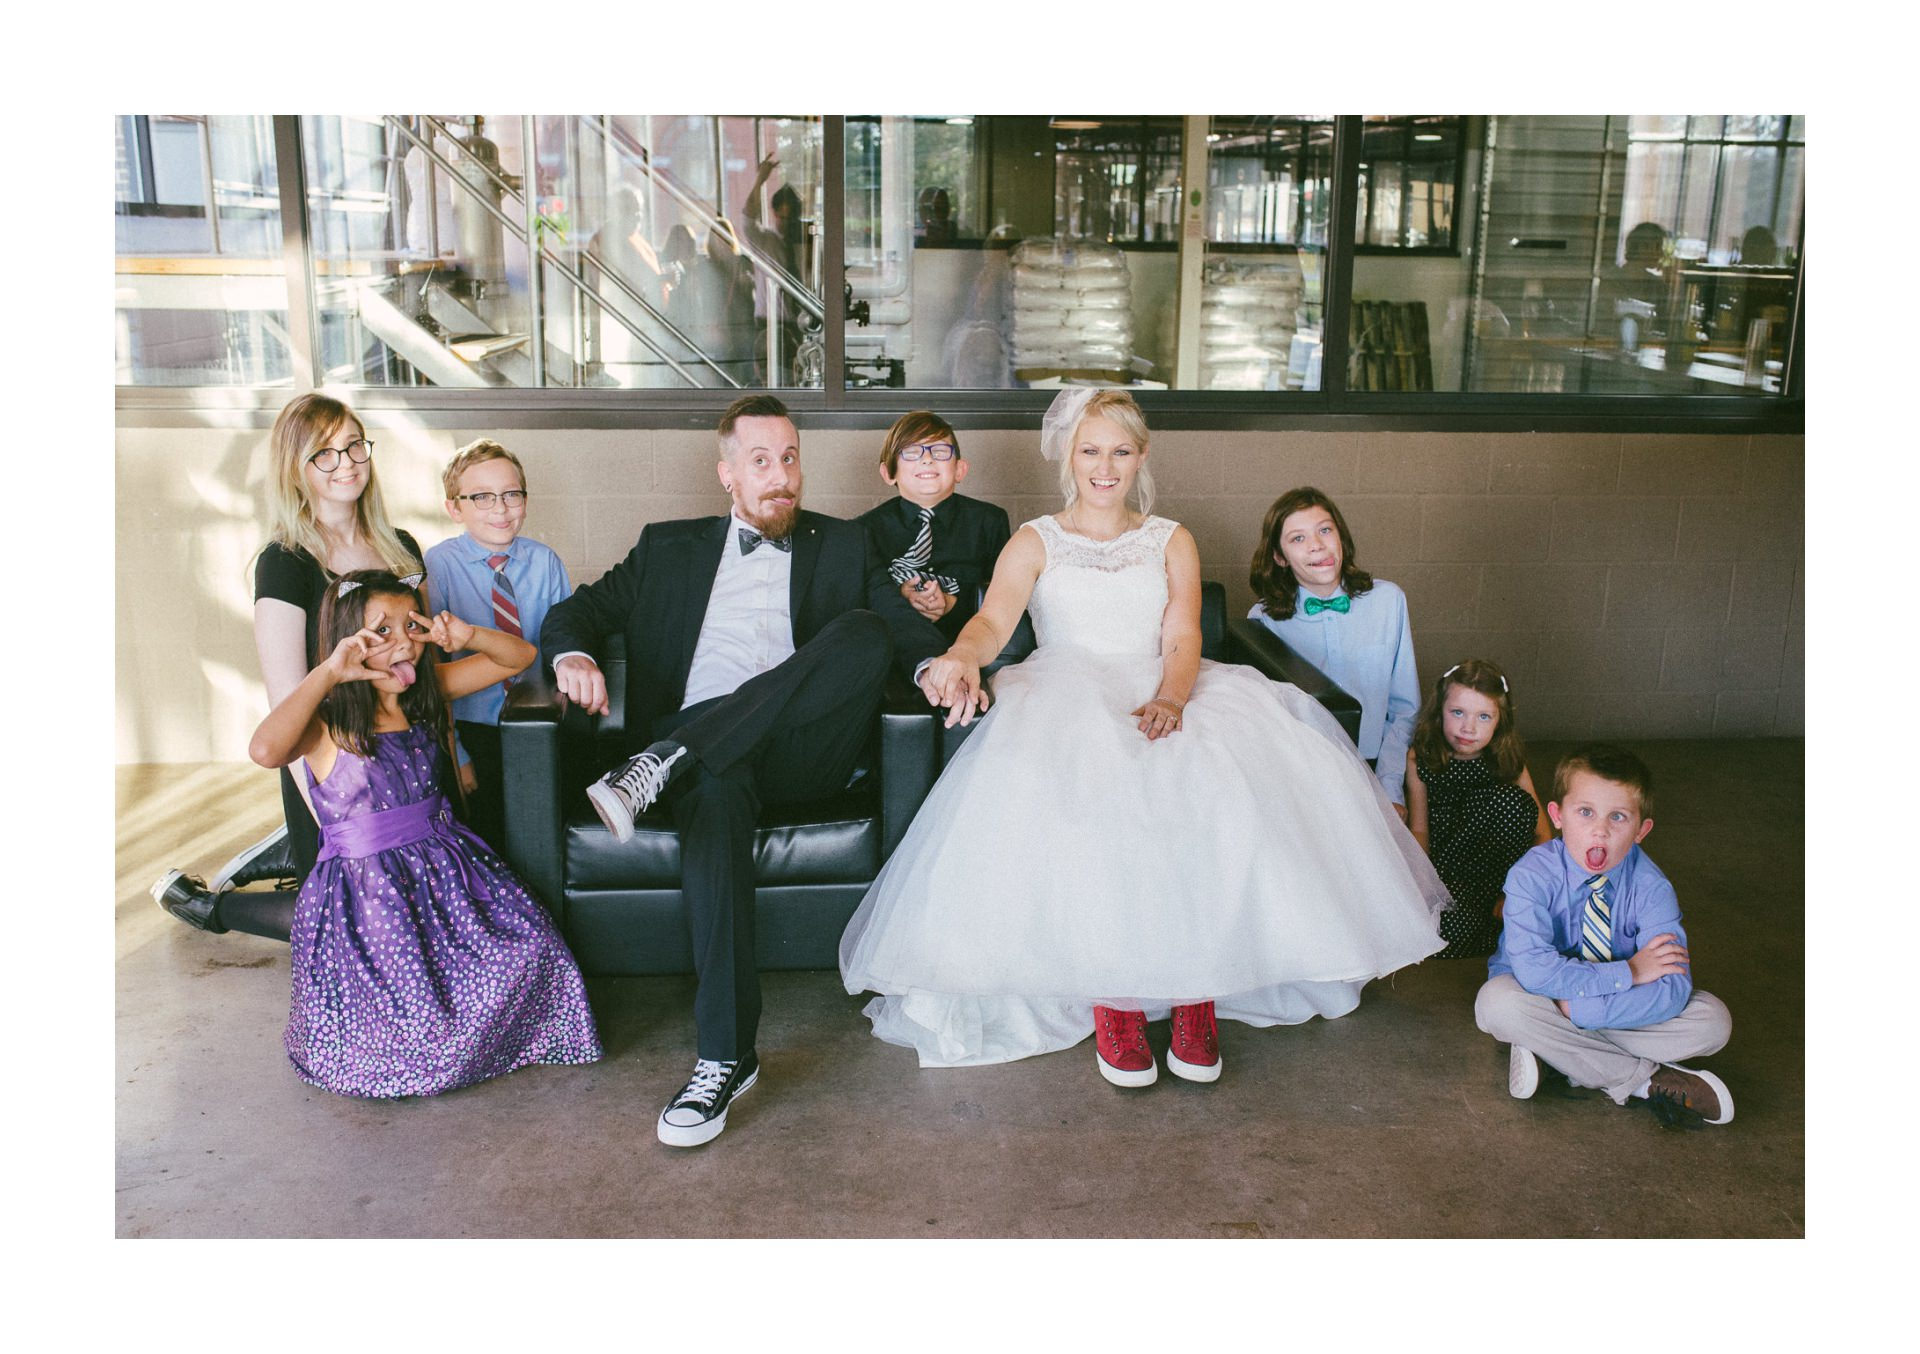 Goldhorn Brewery Wedding Photos in Cleveland 2 27.jpg